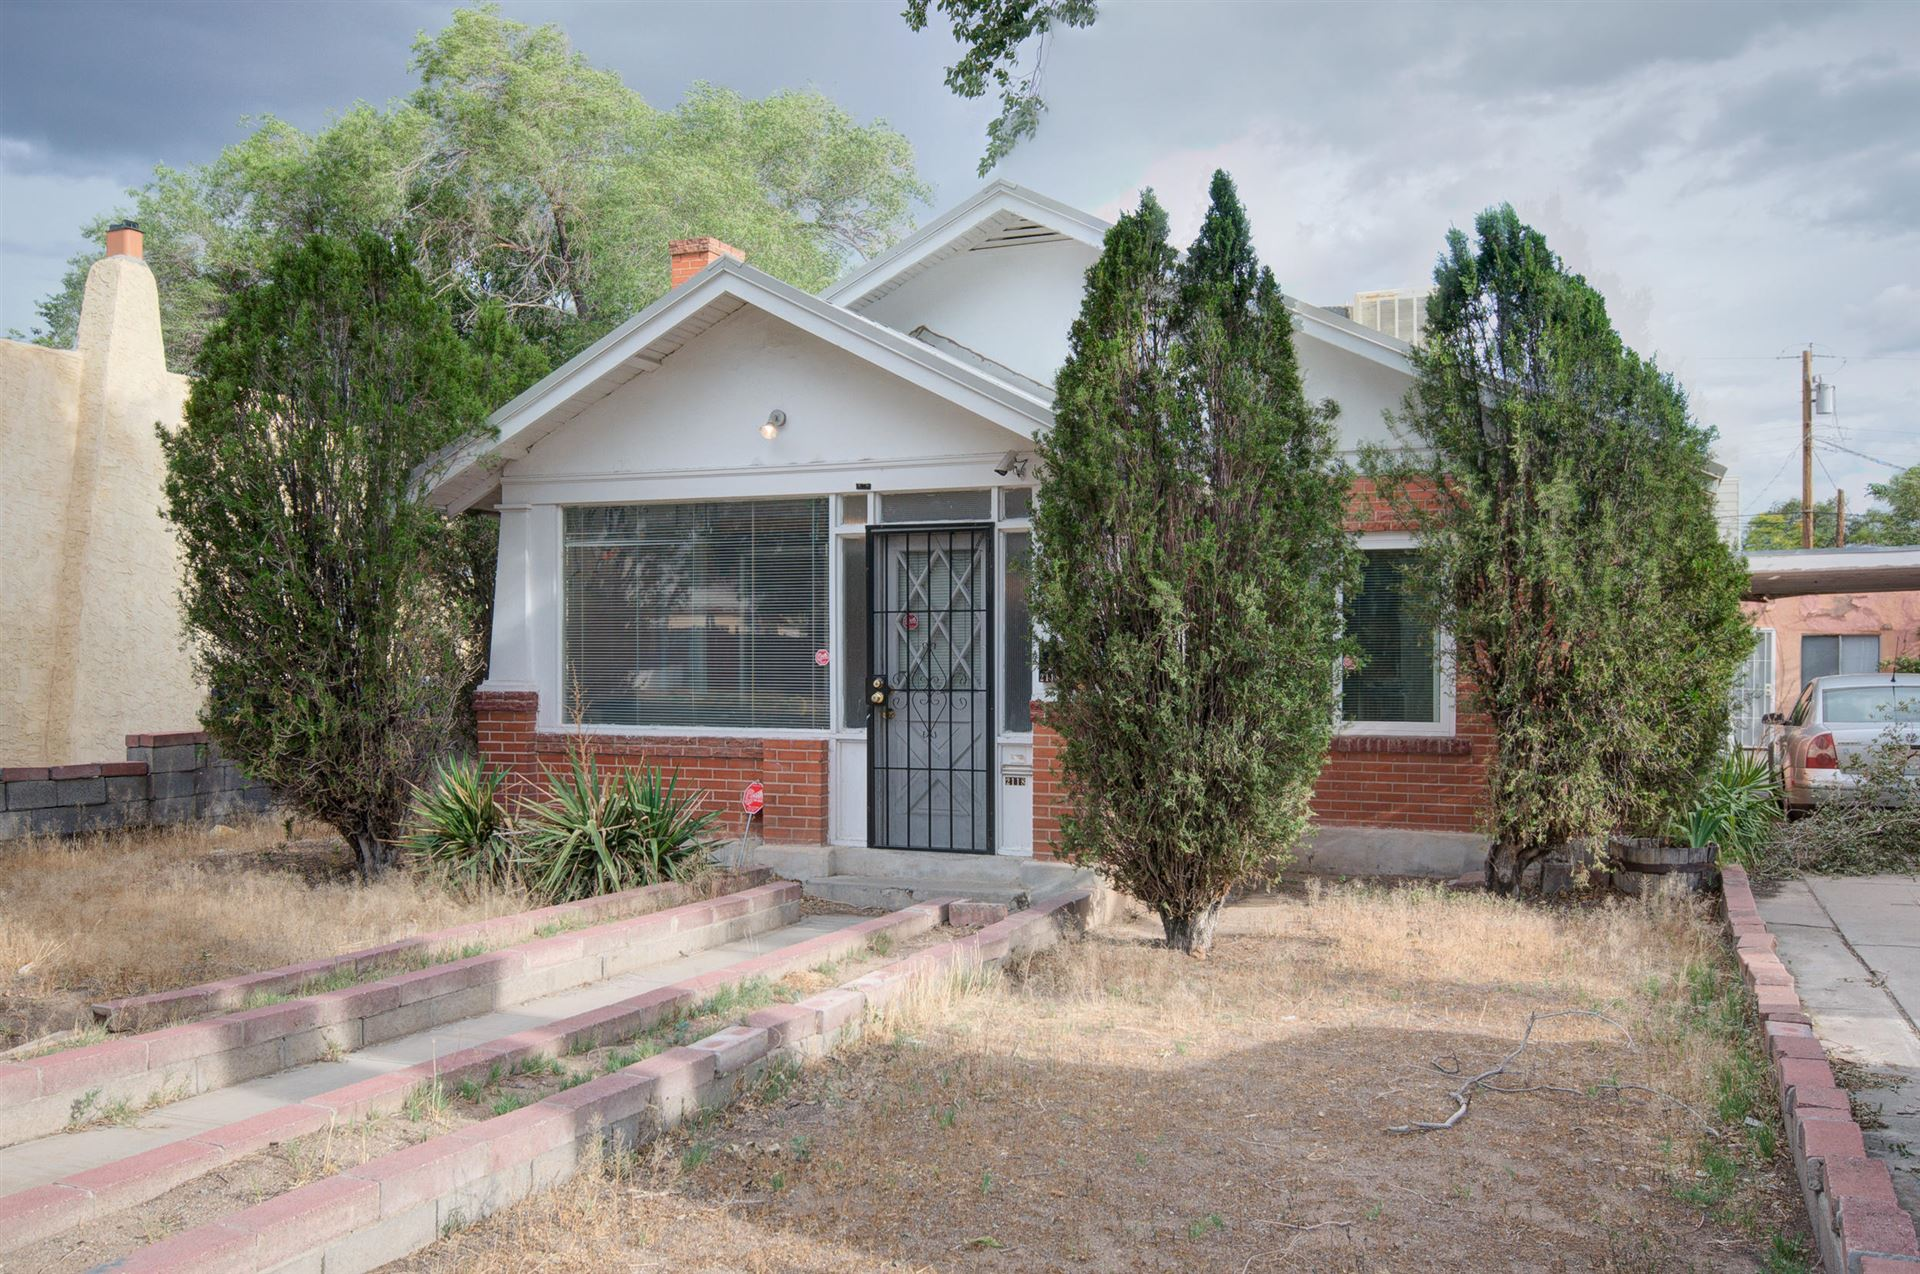 Photo of 2118 OXFORD Avenue SE, Albuquerque, NM 87106 (MLS # 970768)